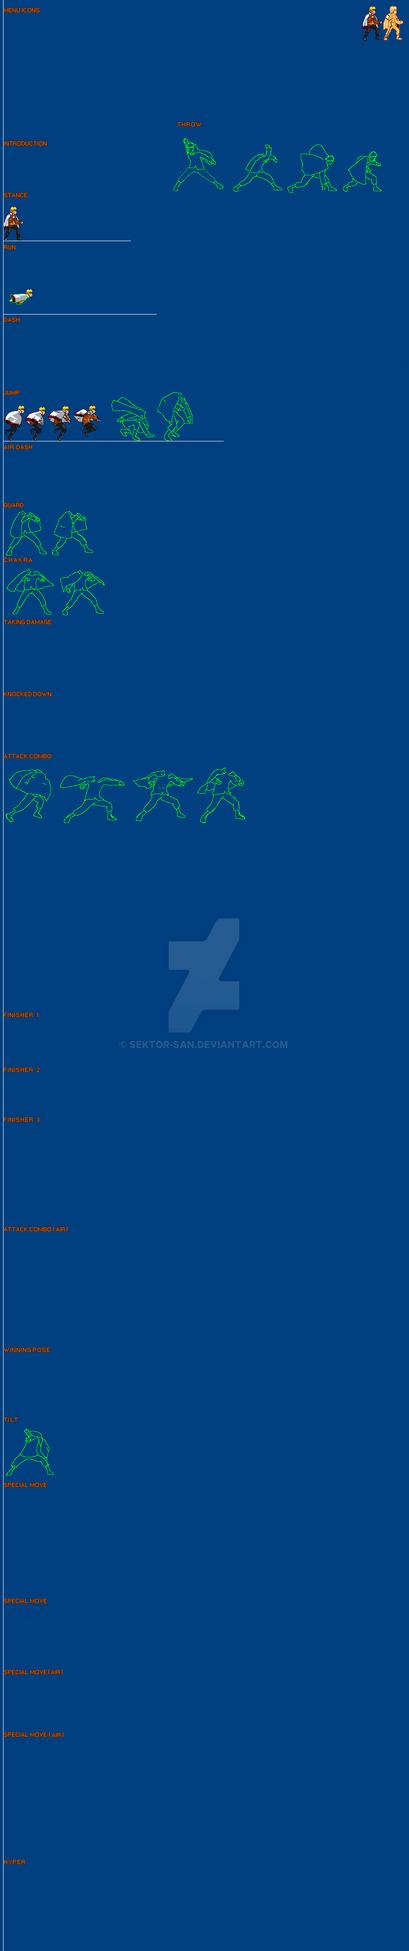 Naruto Hokage NZC (3%) W.i.p by Sektor-San